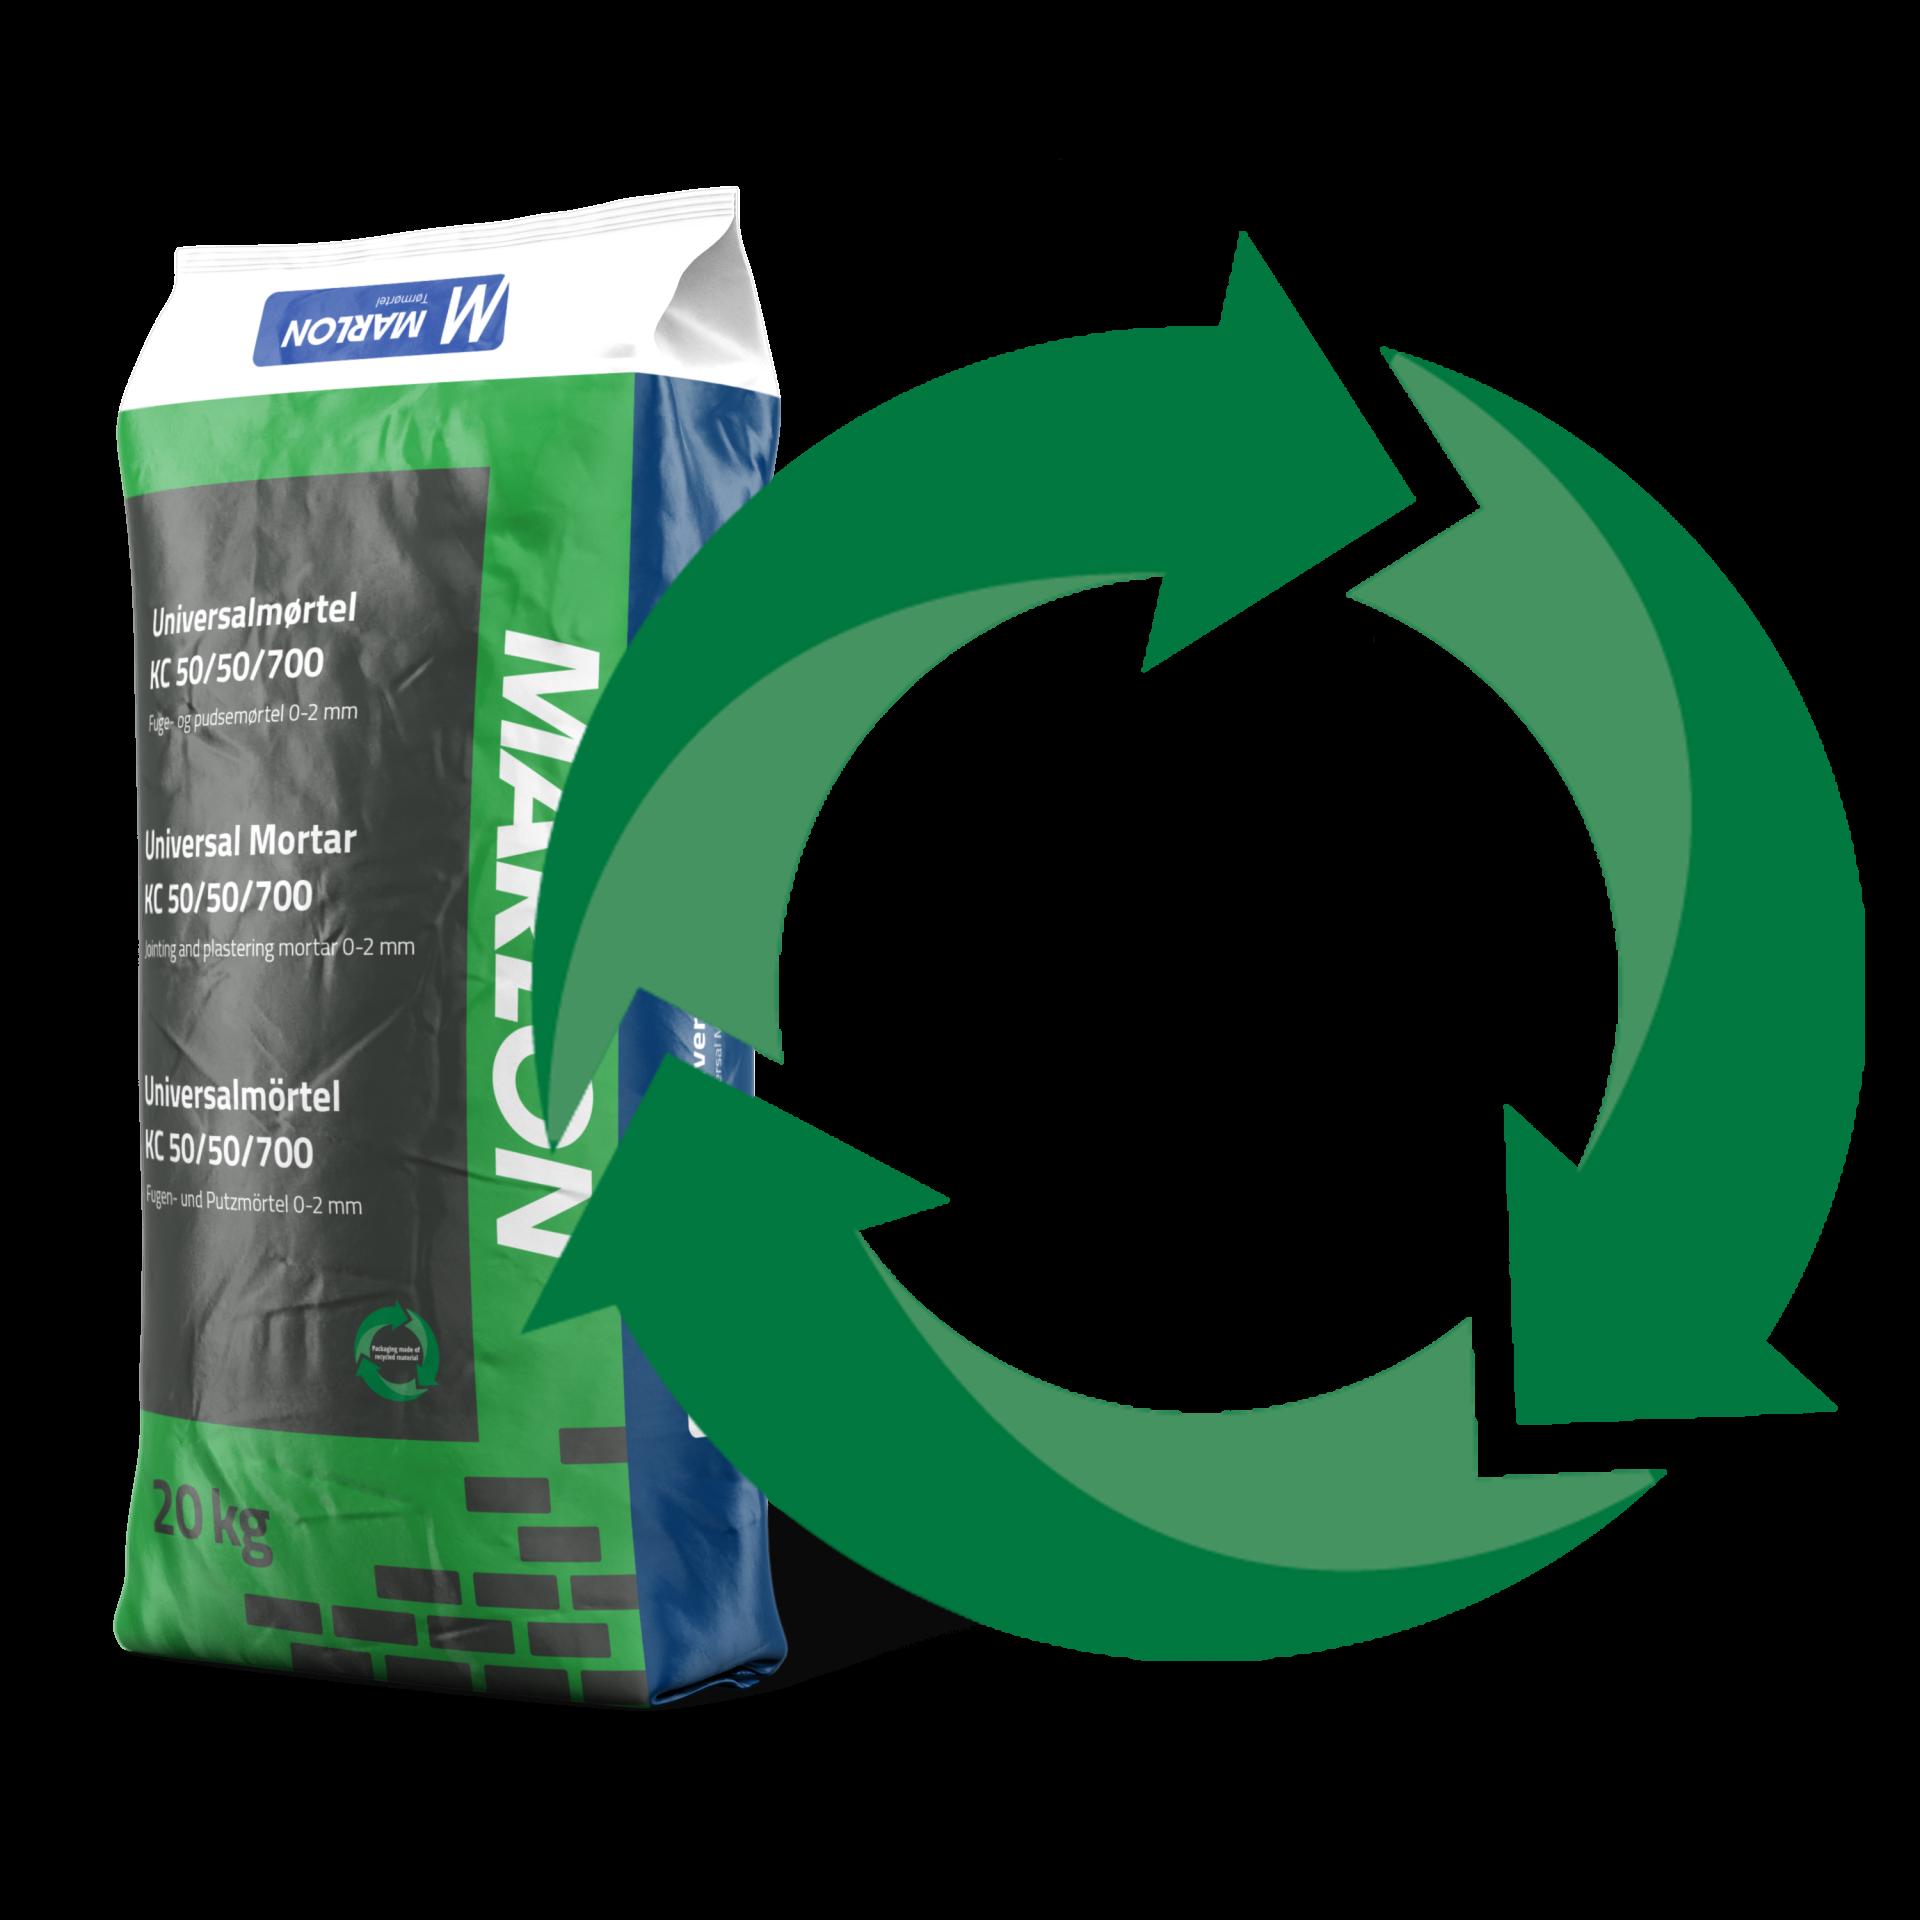 Marlon - Vi benytter genbrugsplast – for miljøets skyld